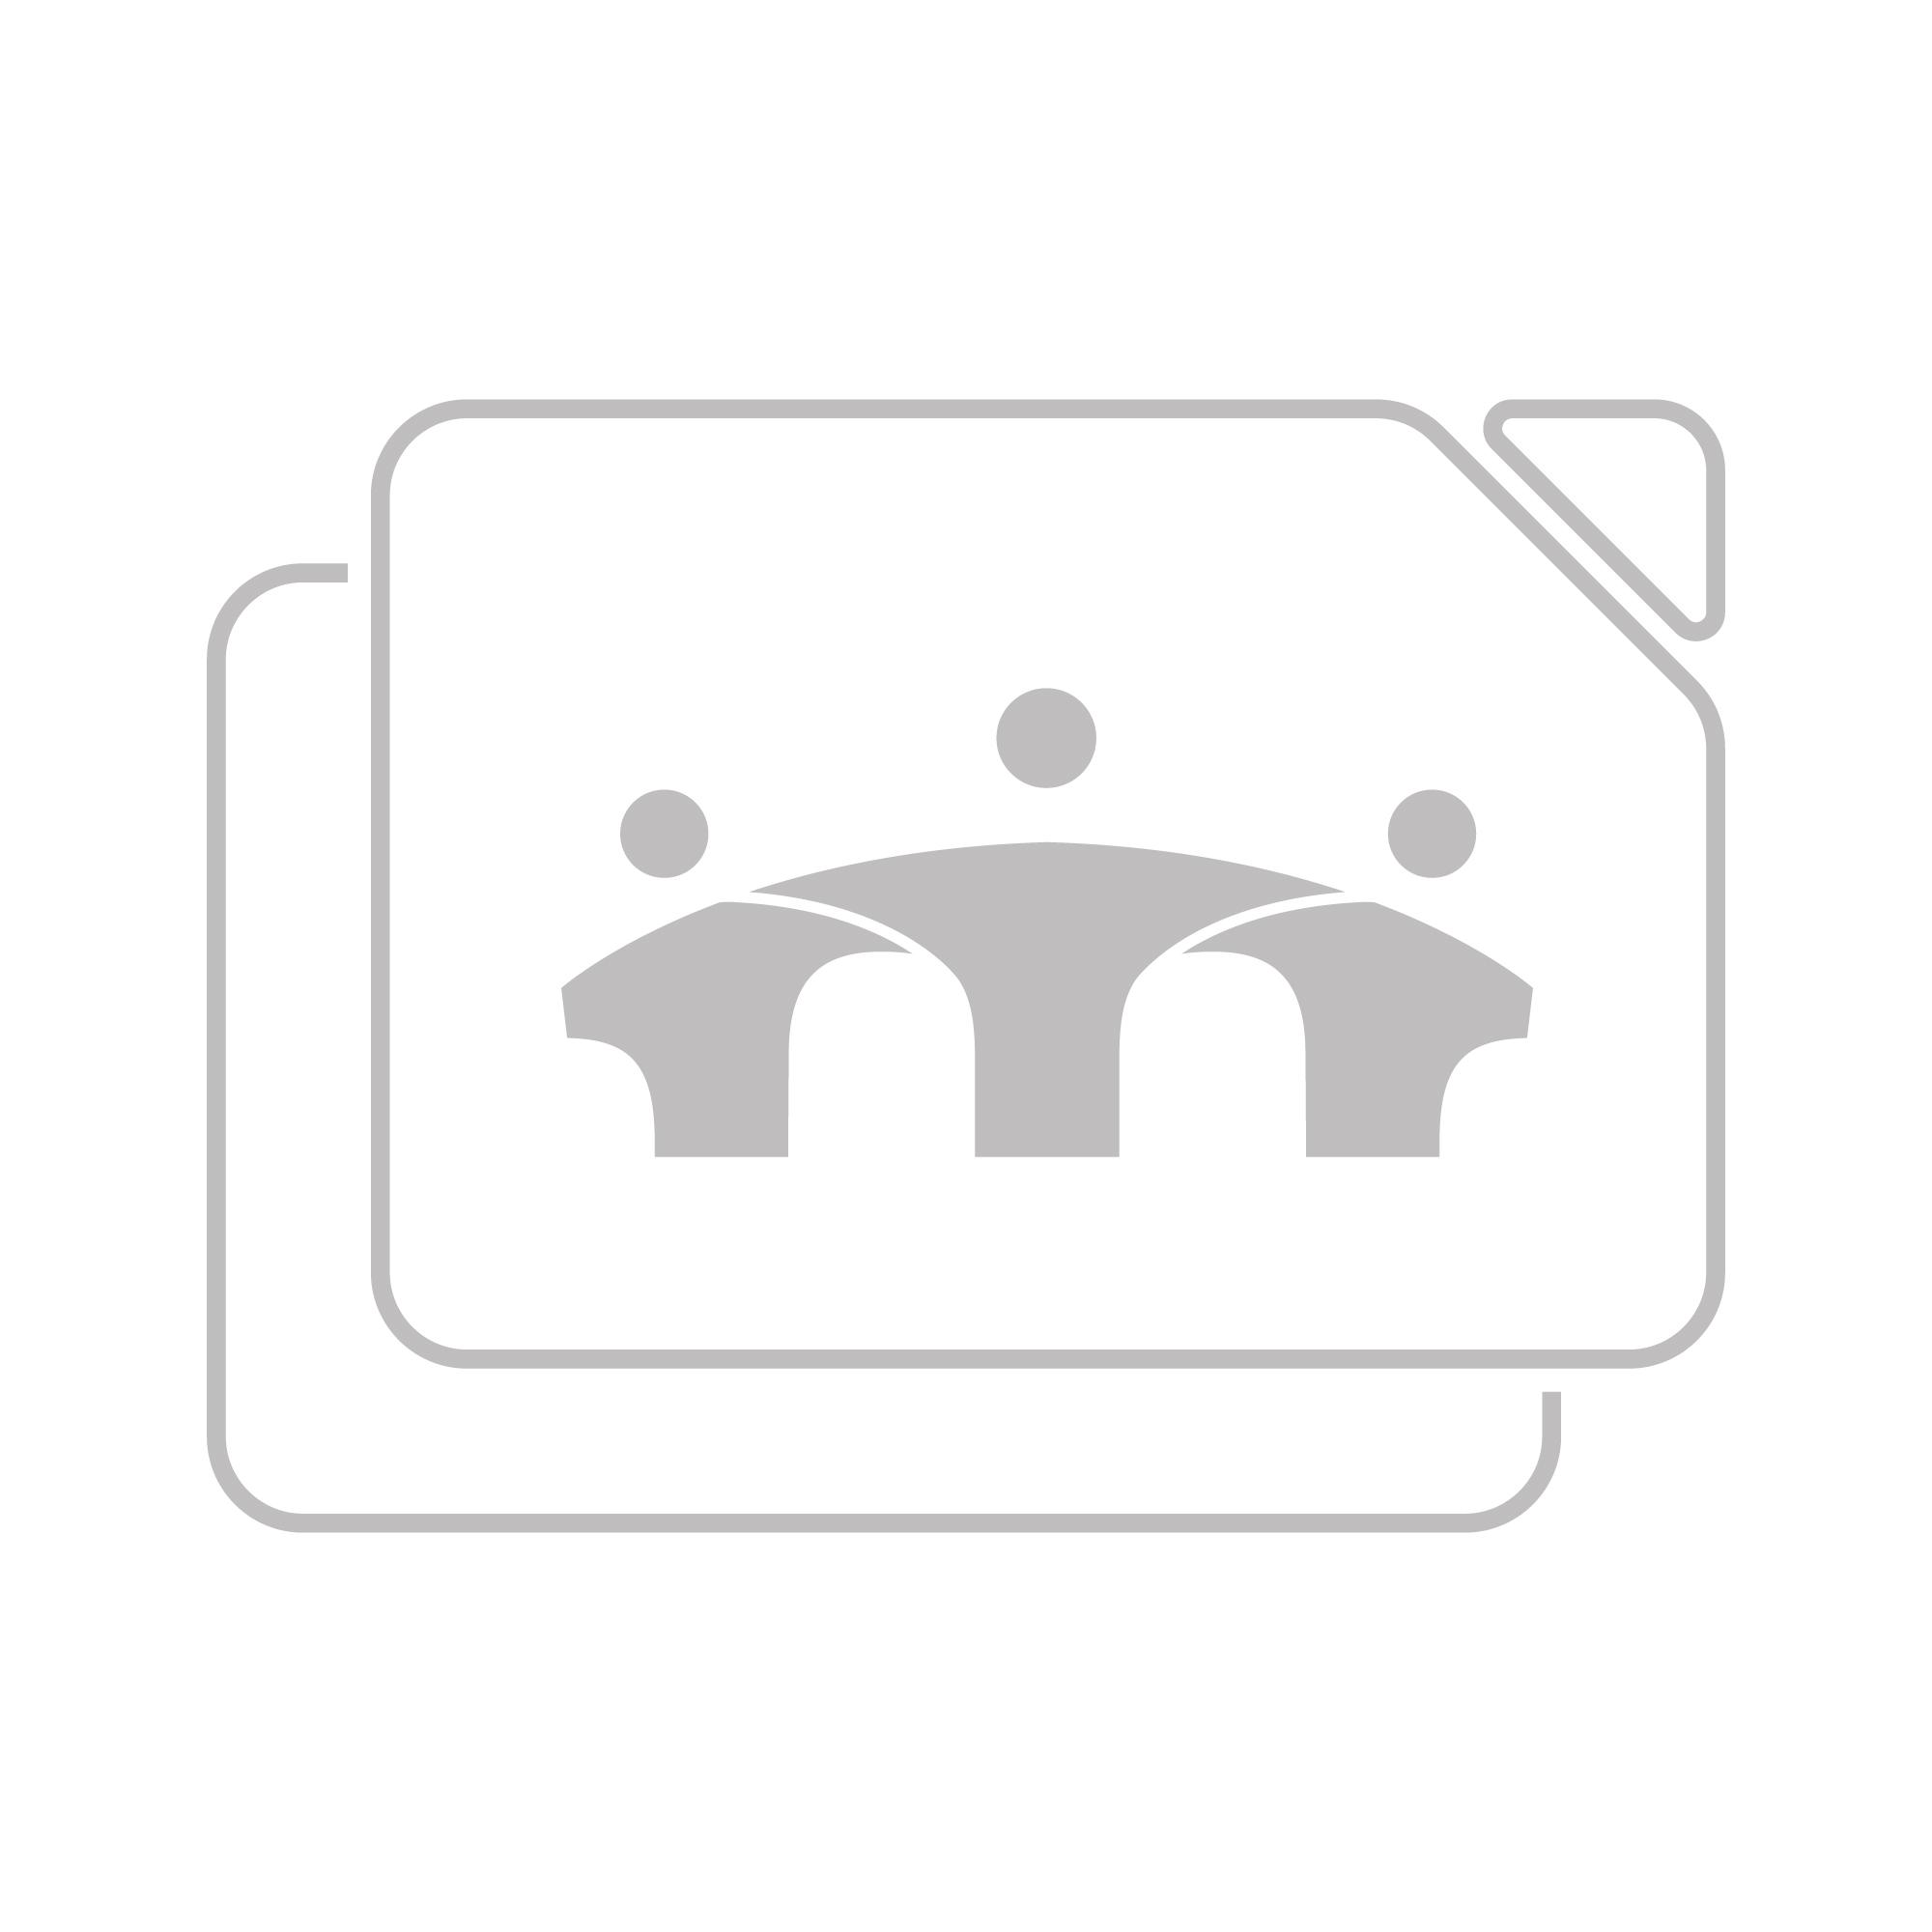 Kingston MobileLite DUO 3C Card Reader